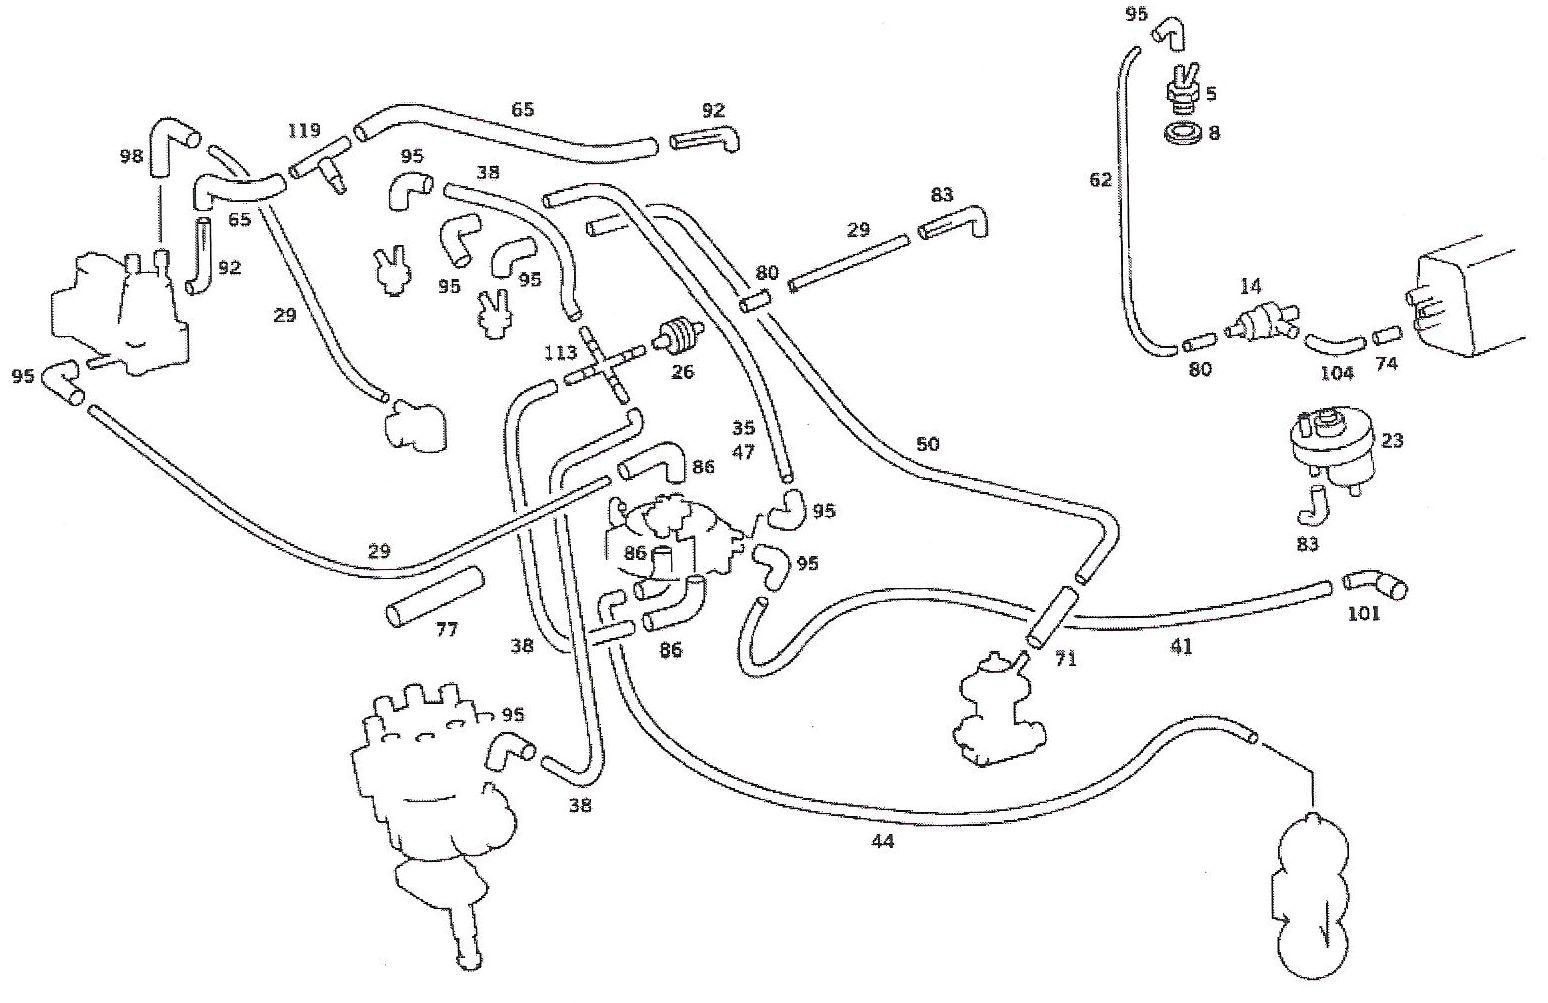 3vze vacuum line diagram vacuum timing advance problem on an  81 380sel mercedes benz forum  mercedes benz forum